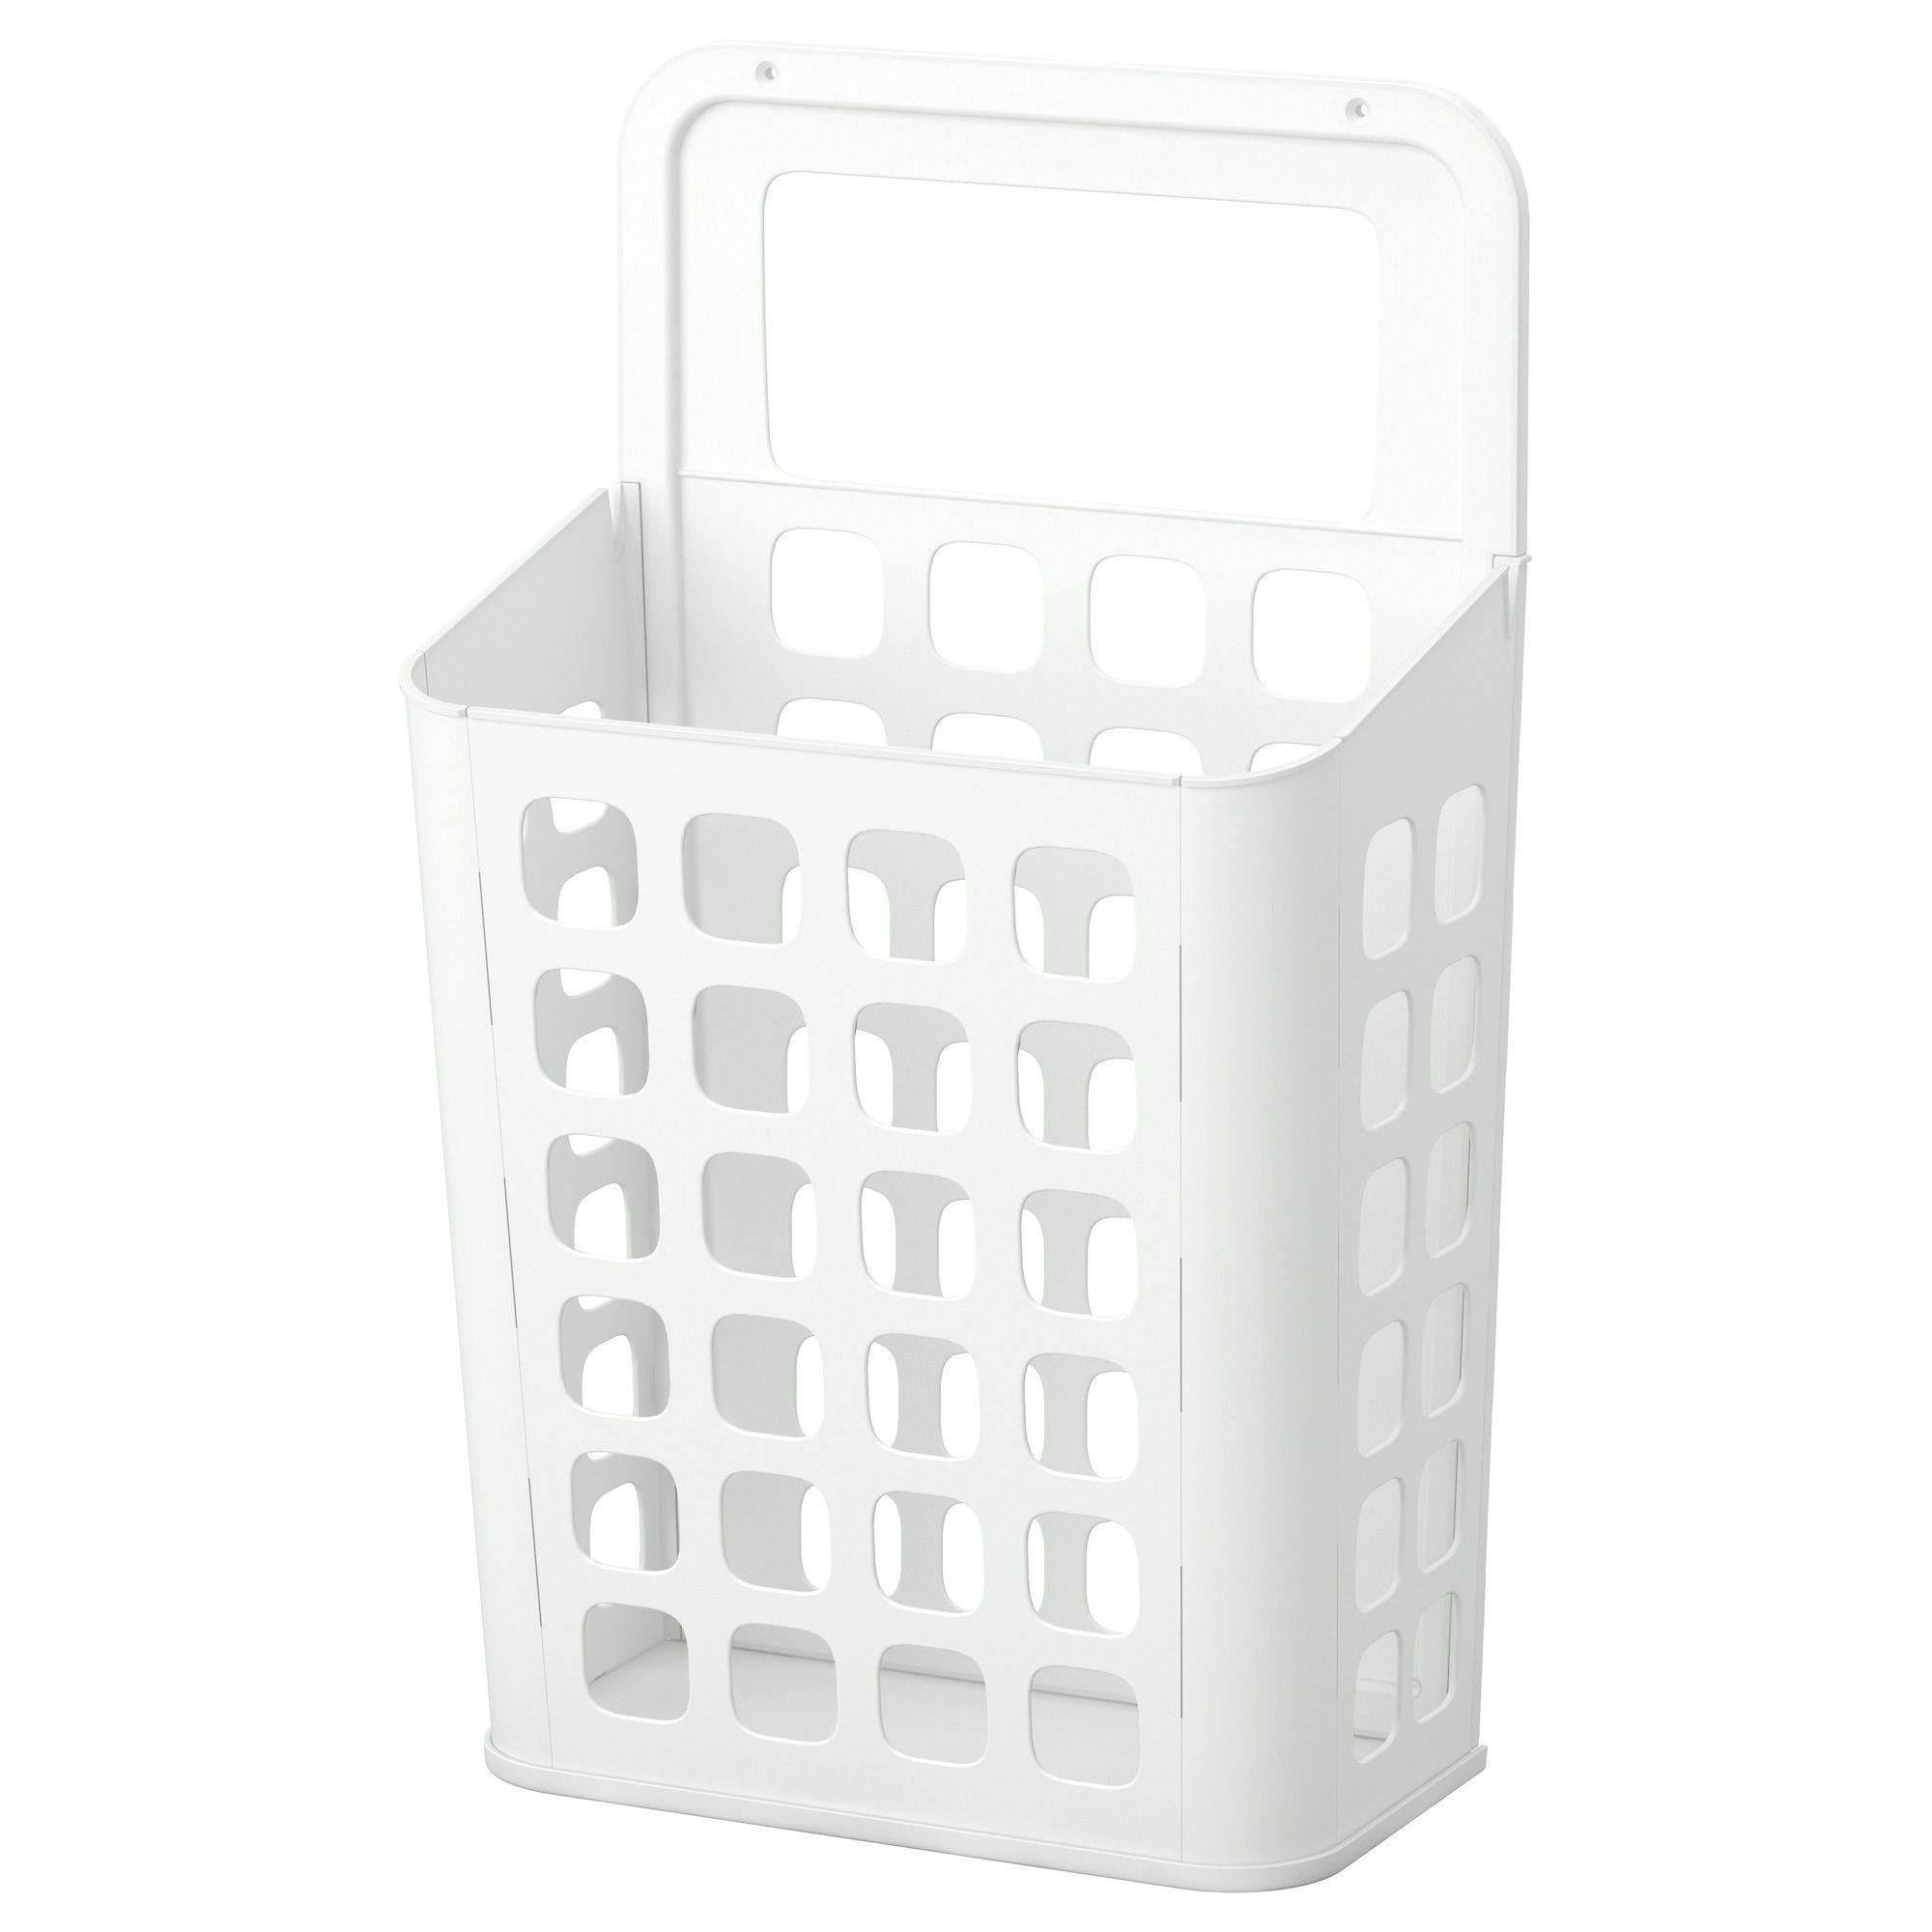 Variera Trash Can White 3 Gallon Ikea Ikea Shopping Ikea Kitchen